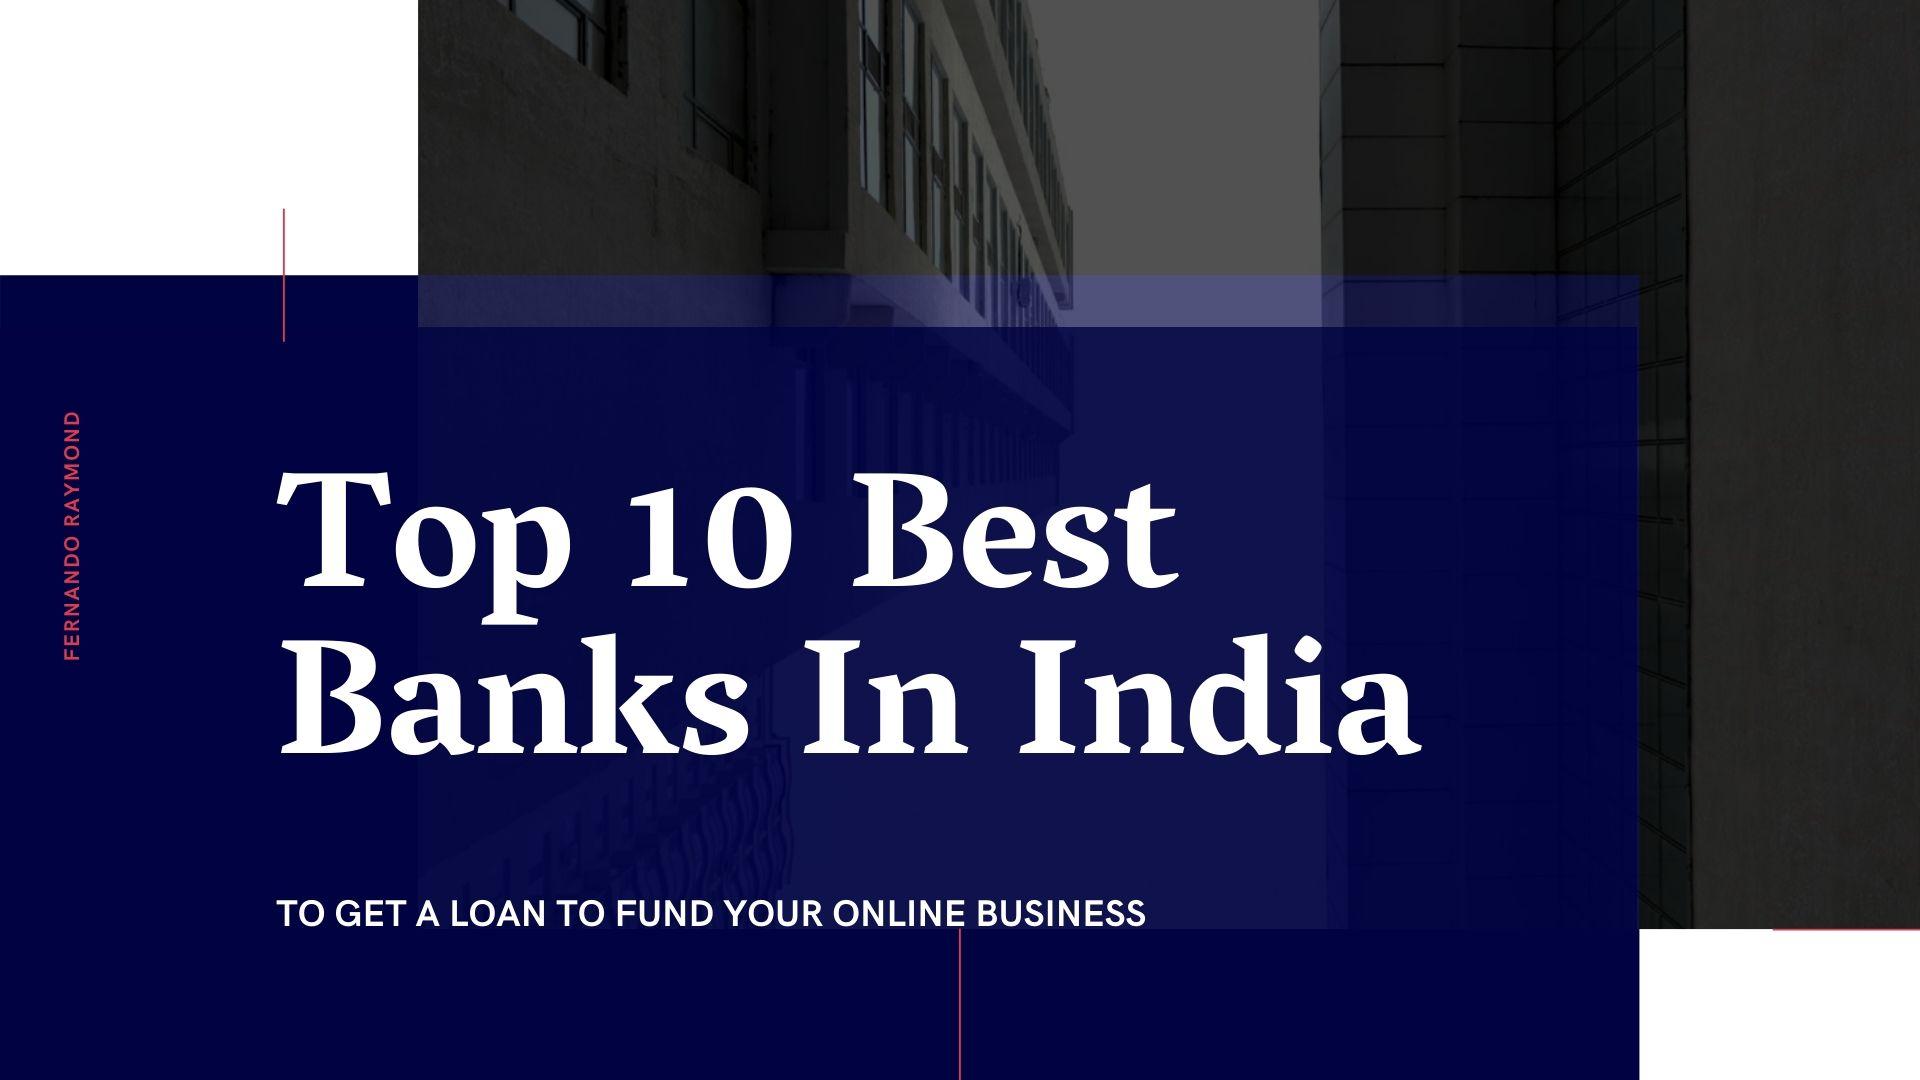 Top-10-Best-Banks-In-India